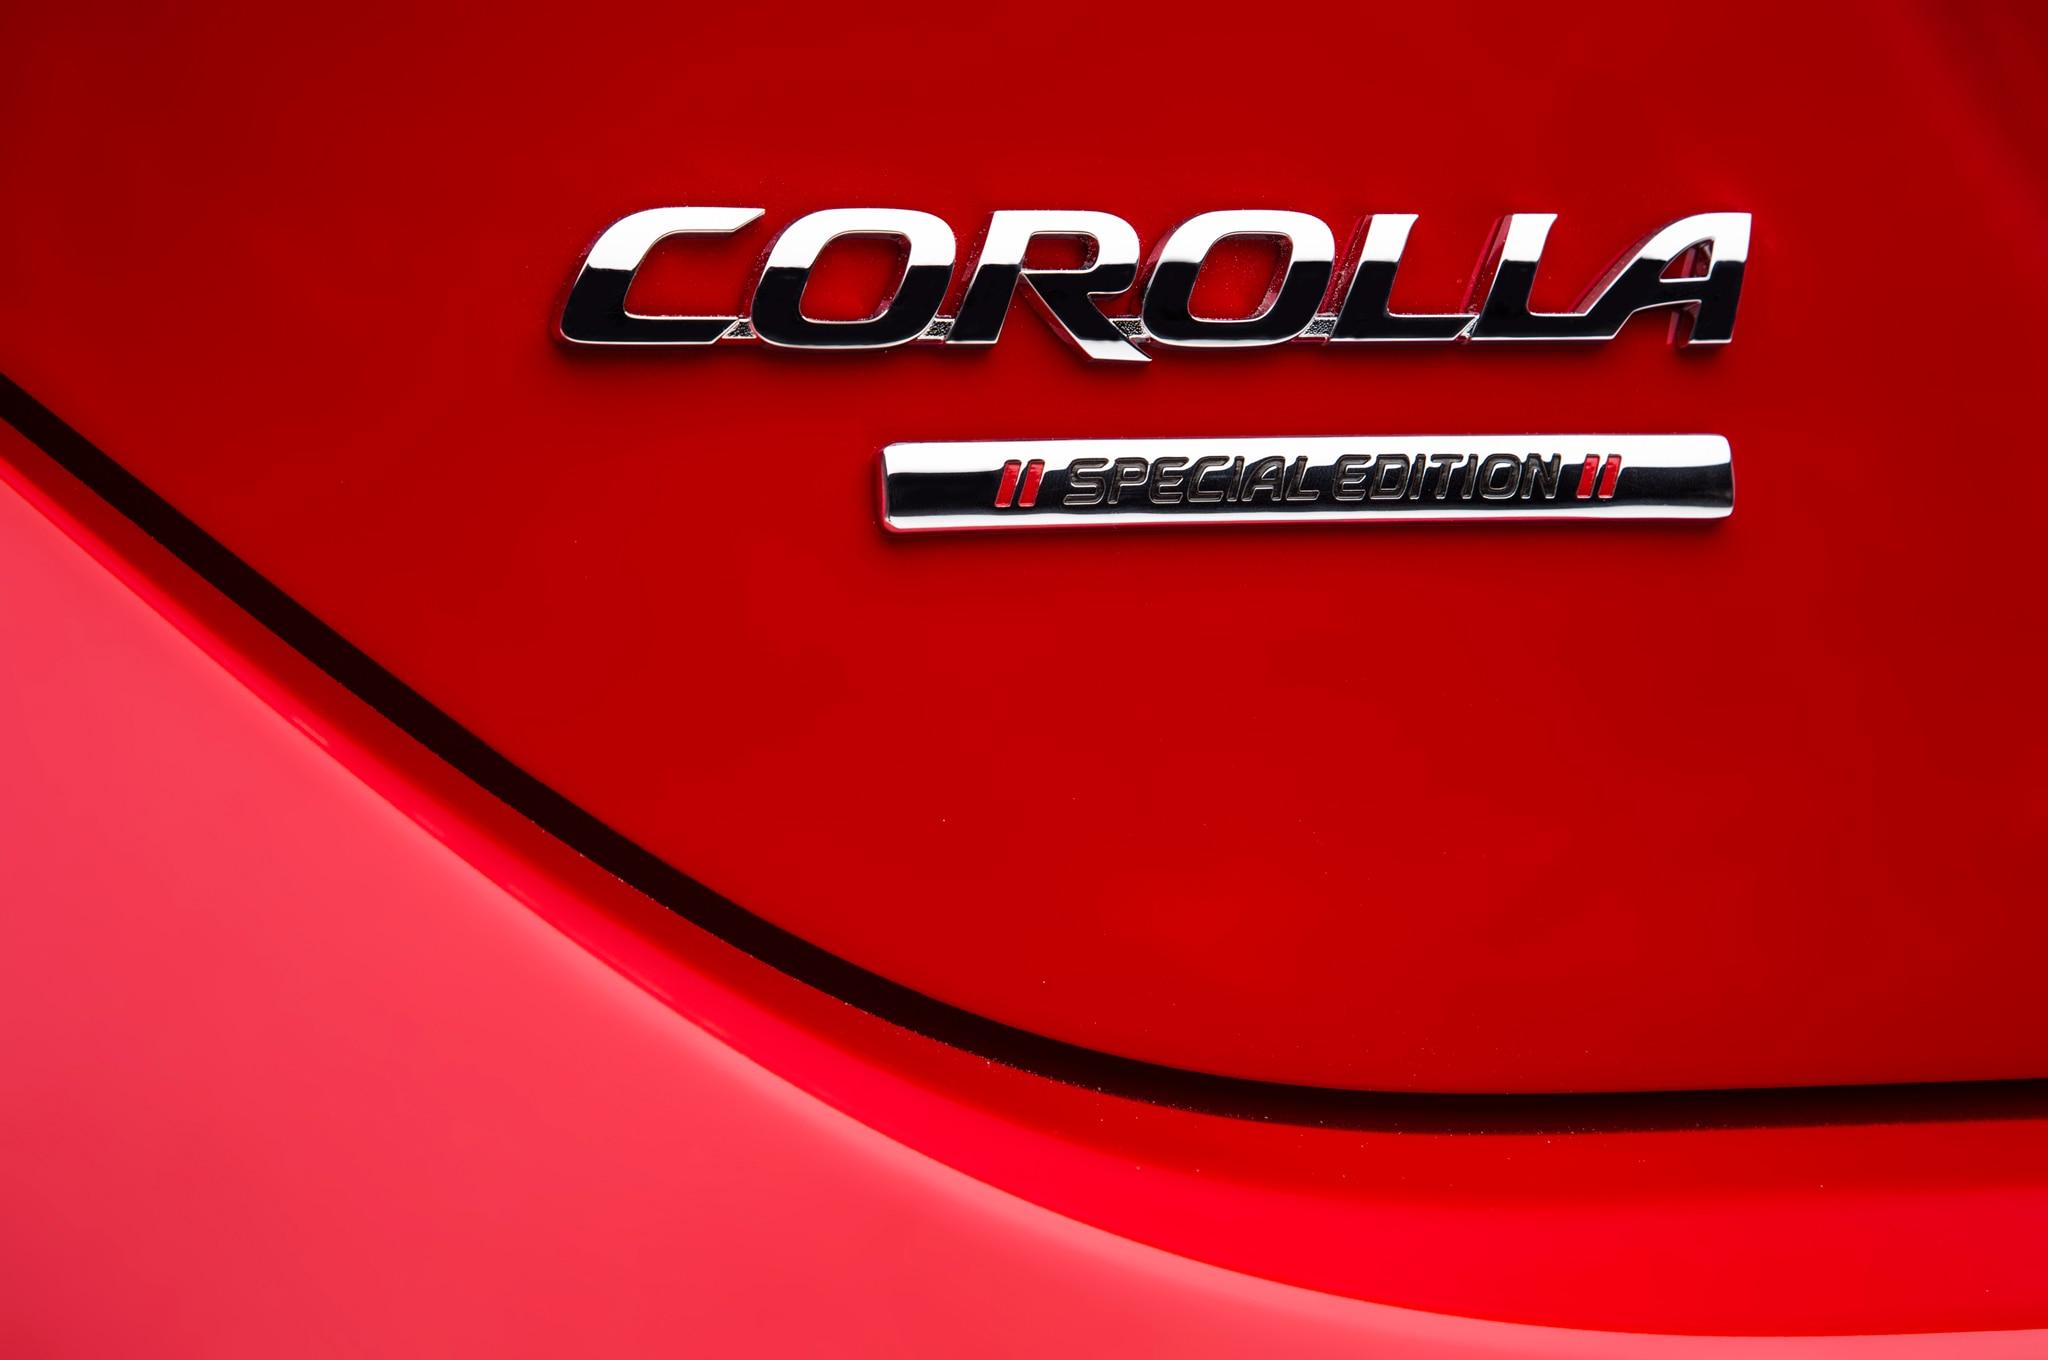 50 Years of the Toyota Corolla